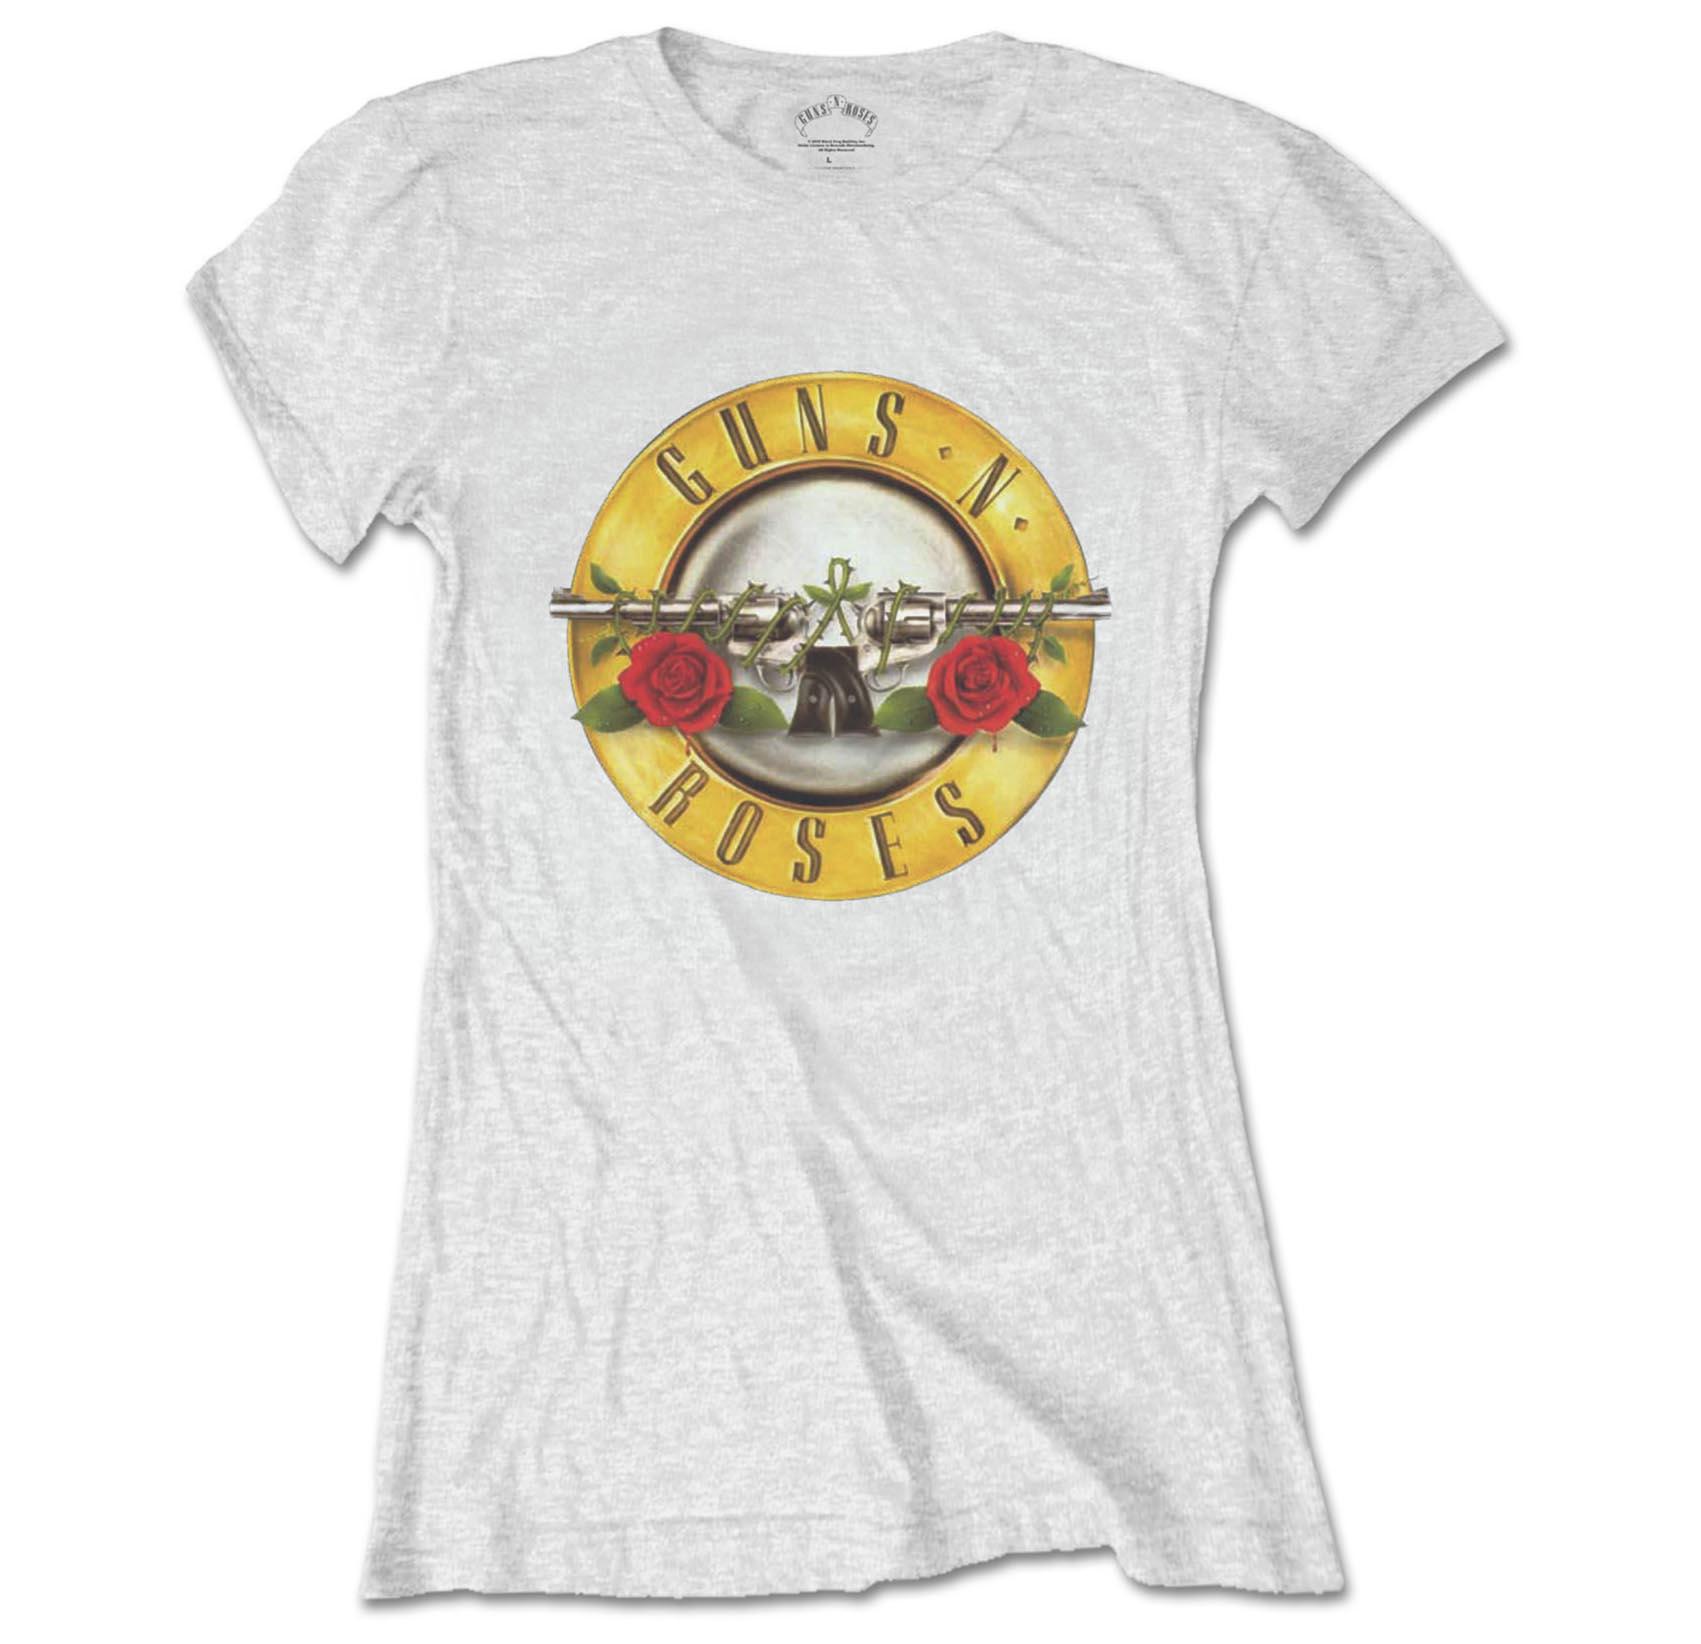 Official Skinny GUNS N ROSES T Shirt Top White Classic Bullet Logo All Sizes